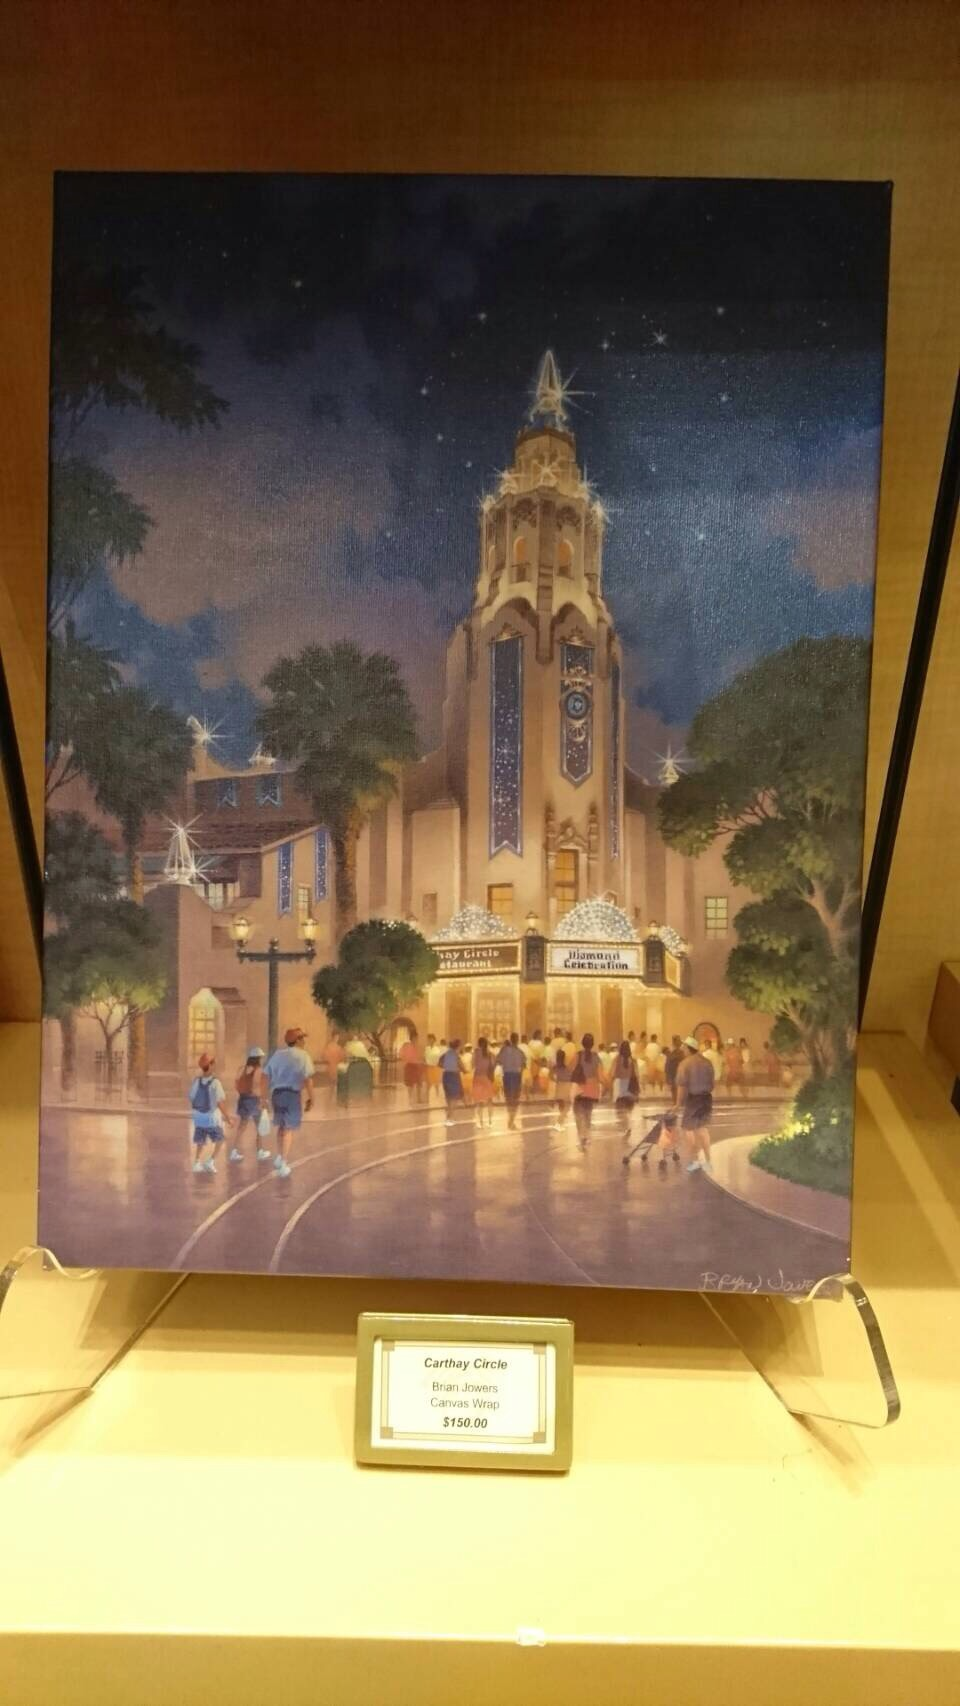 Disneyland ワールドオブディズニー ディズニーギャラリー 絵画 CA 201609